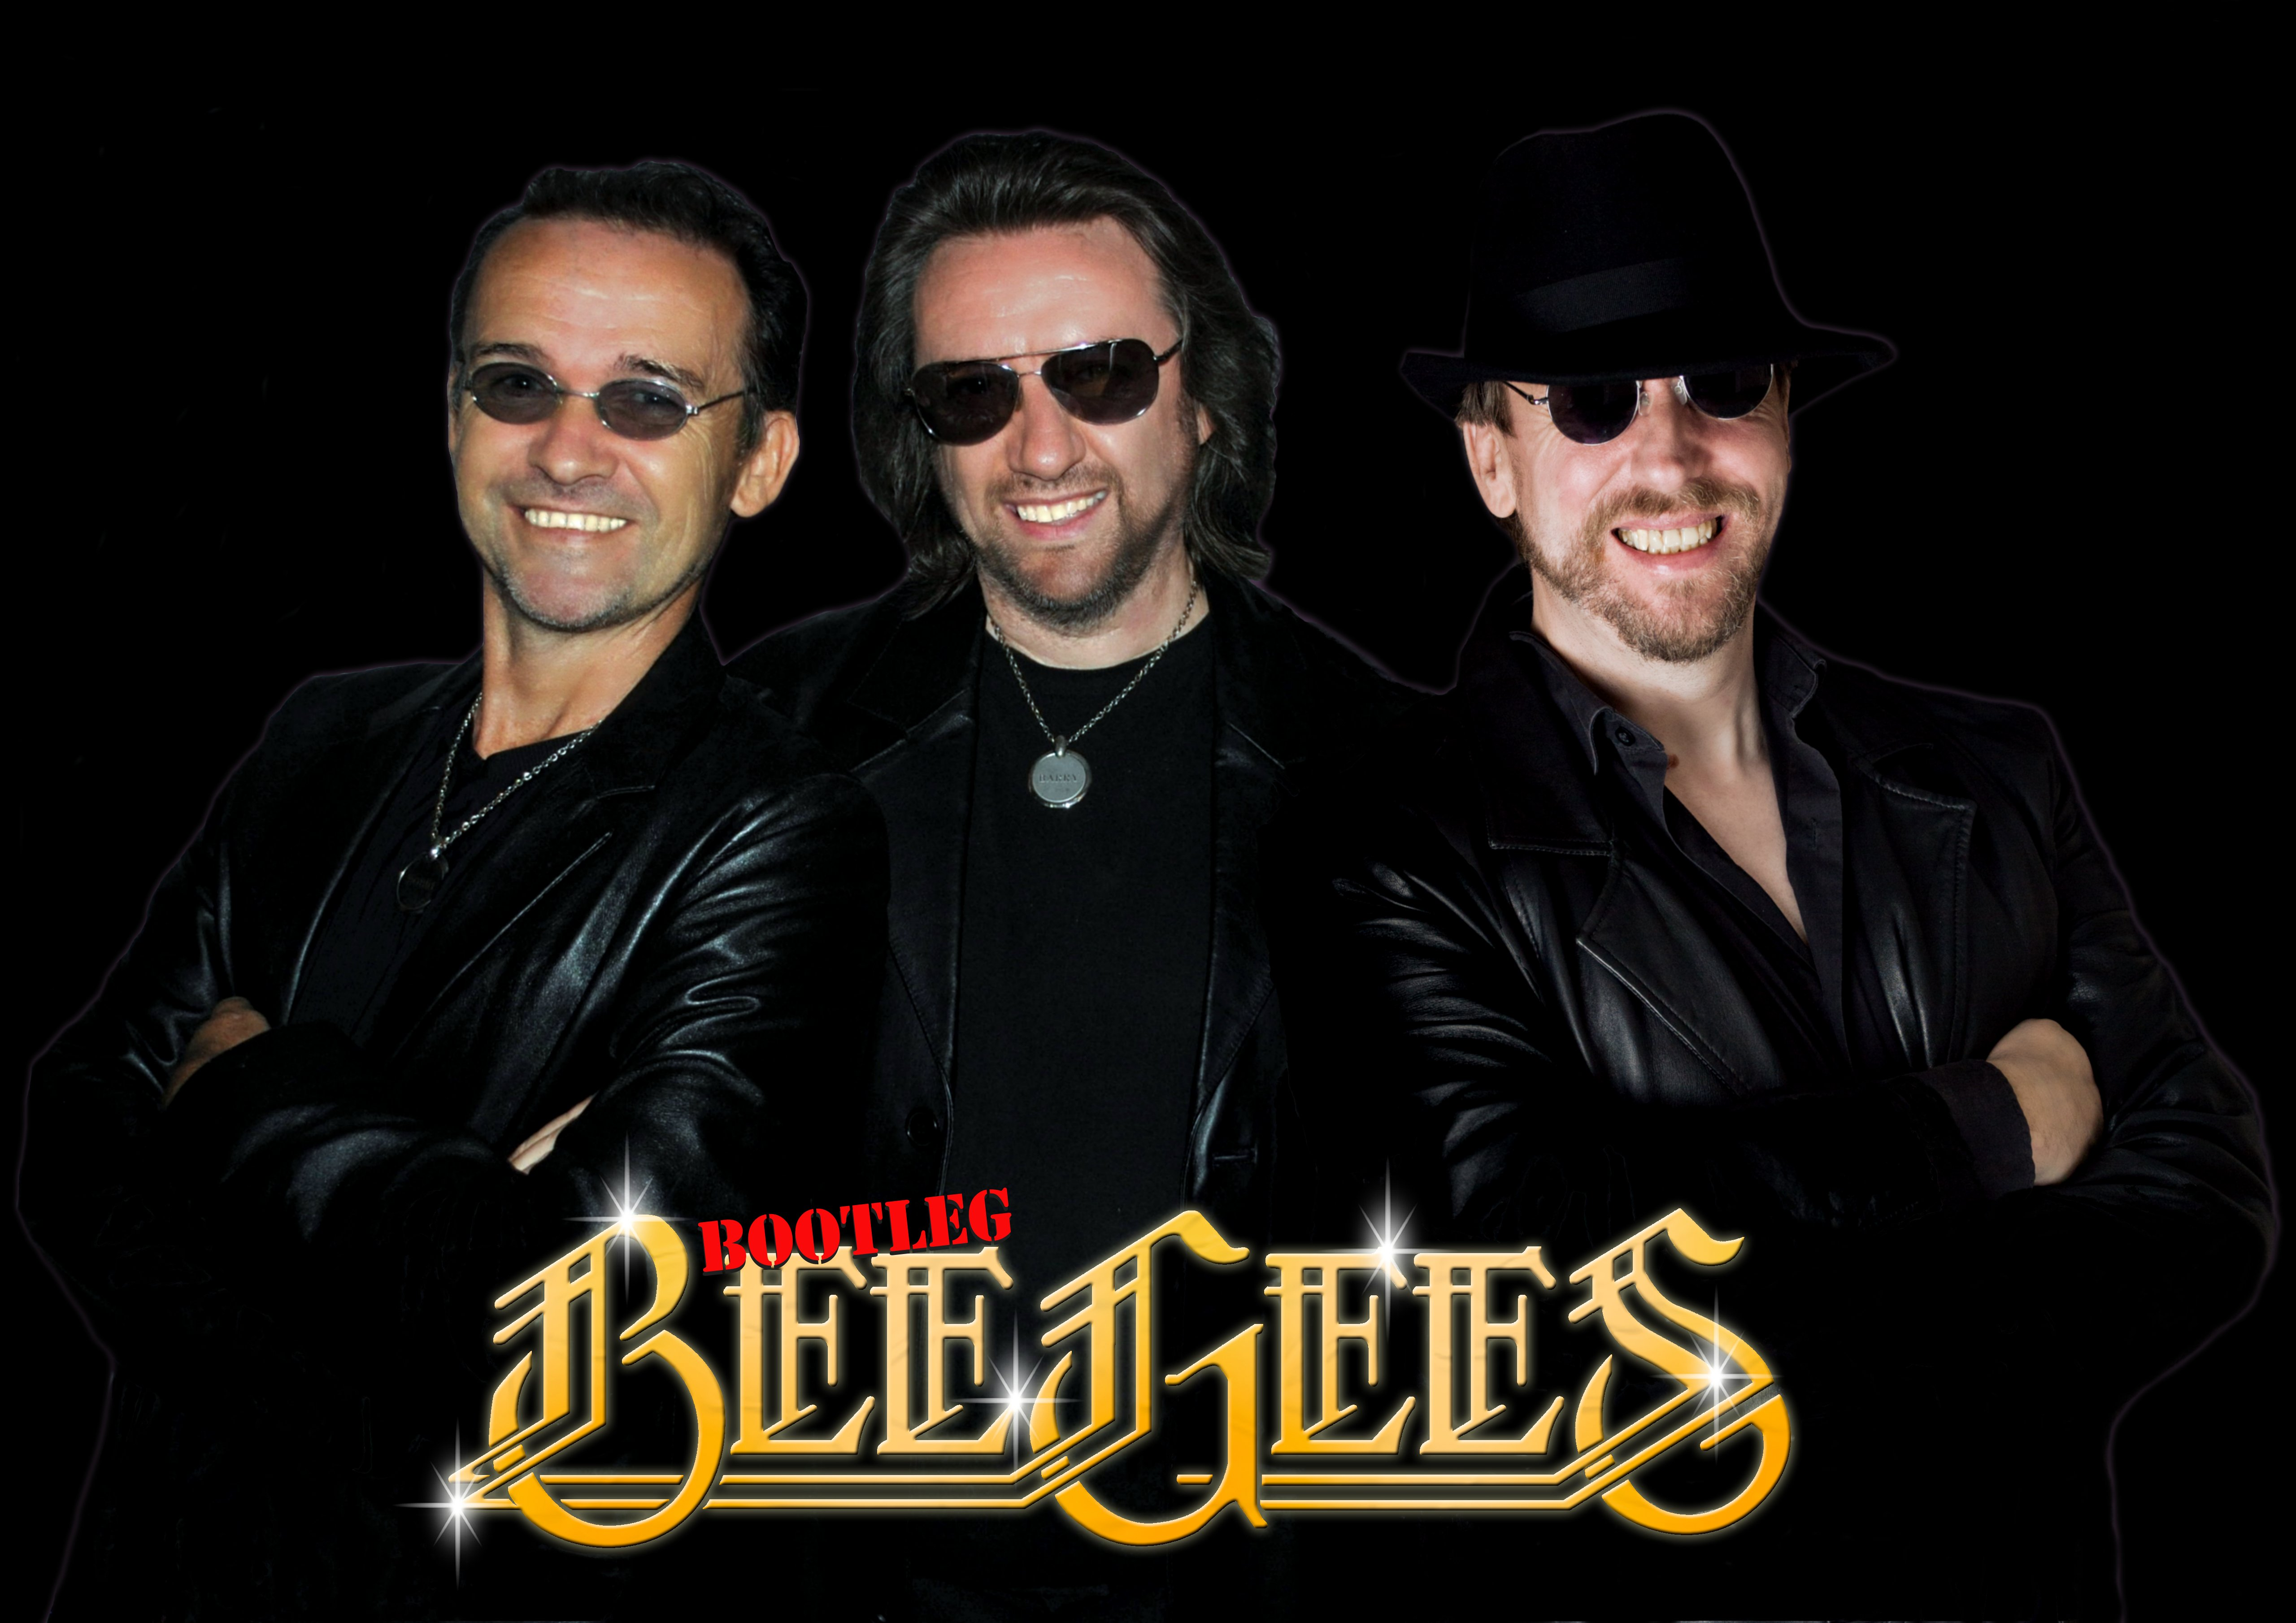 Bee Gees Tribute Band - Bootleg Bee Gees